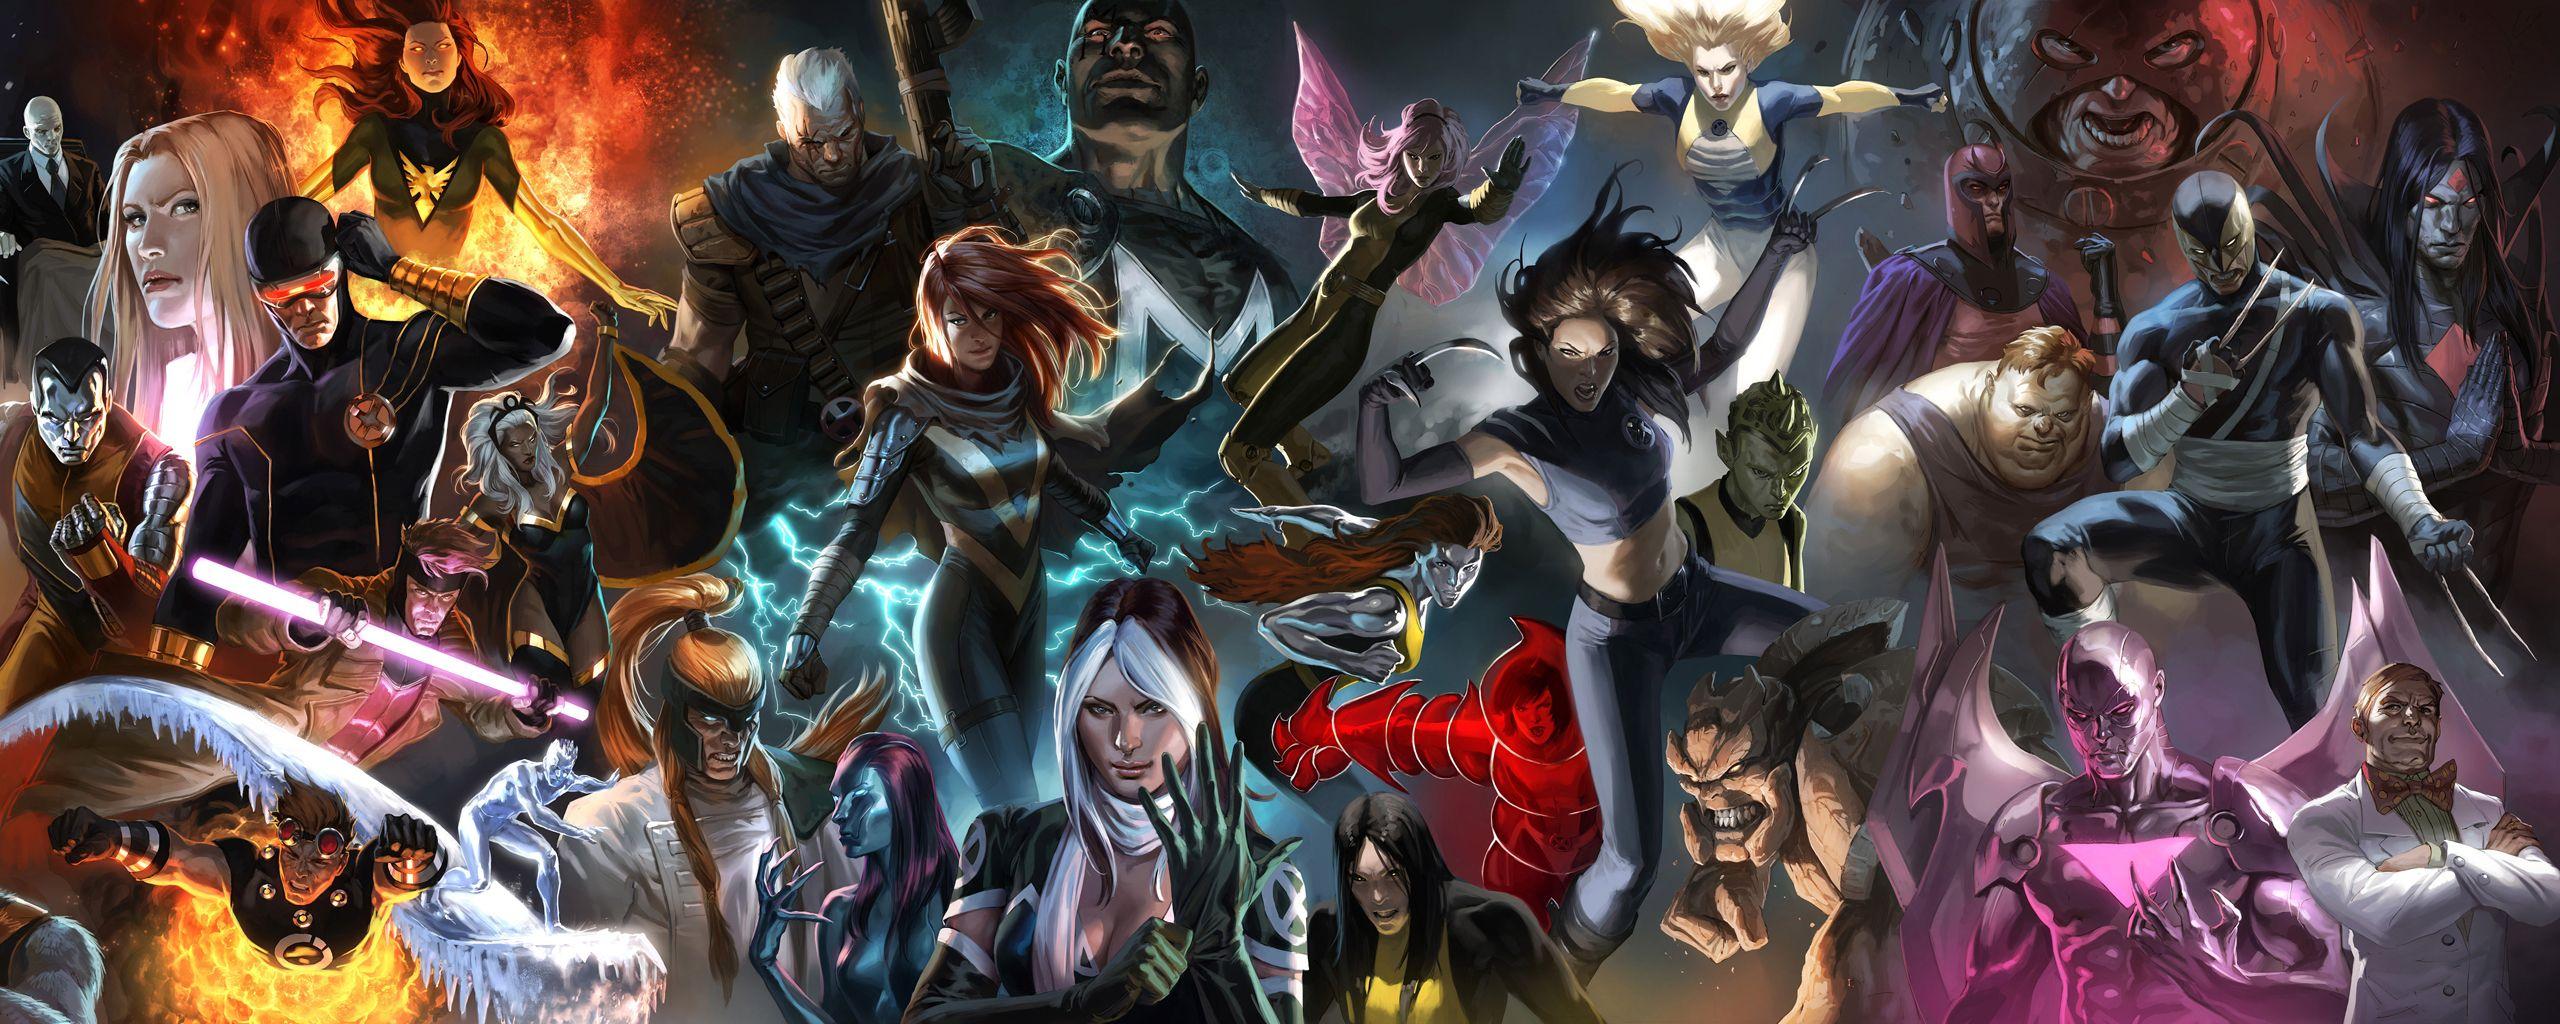 Amazing Wallpaper Marvel Juggernaut - db8f69be051295070c186c566c083b33  Gallery_142647.jpg